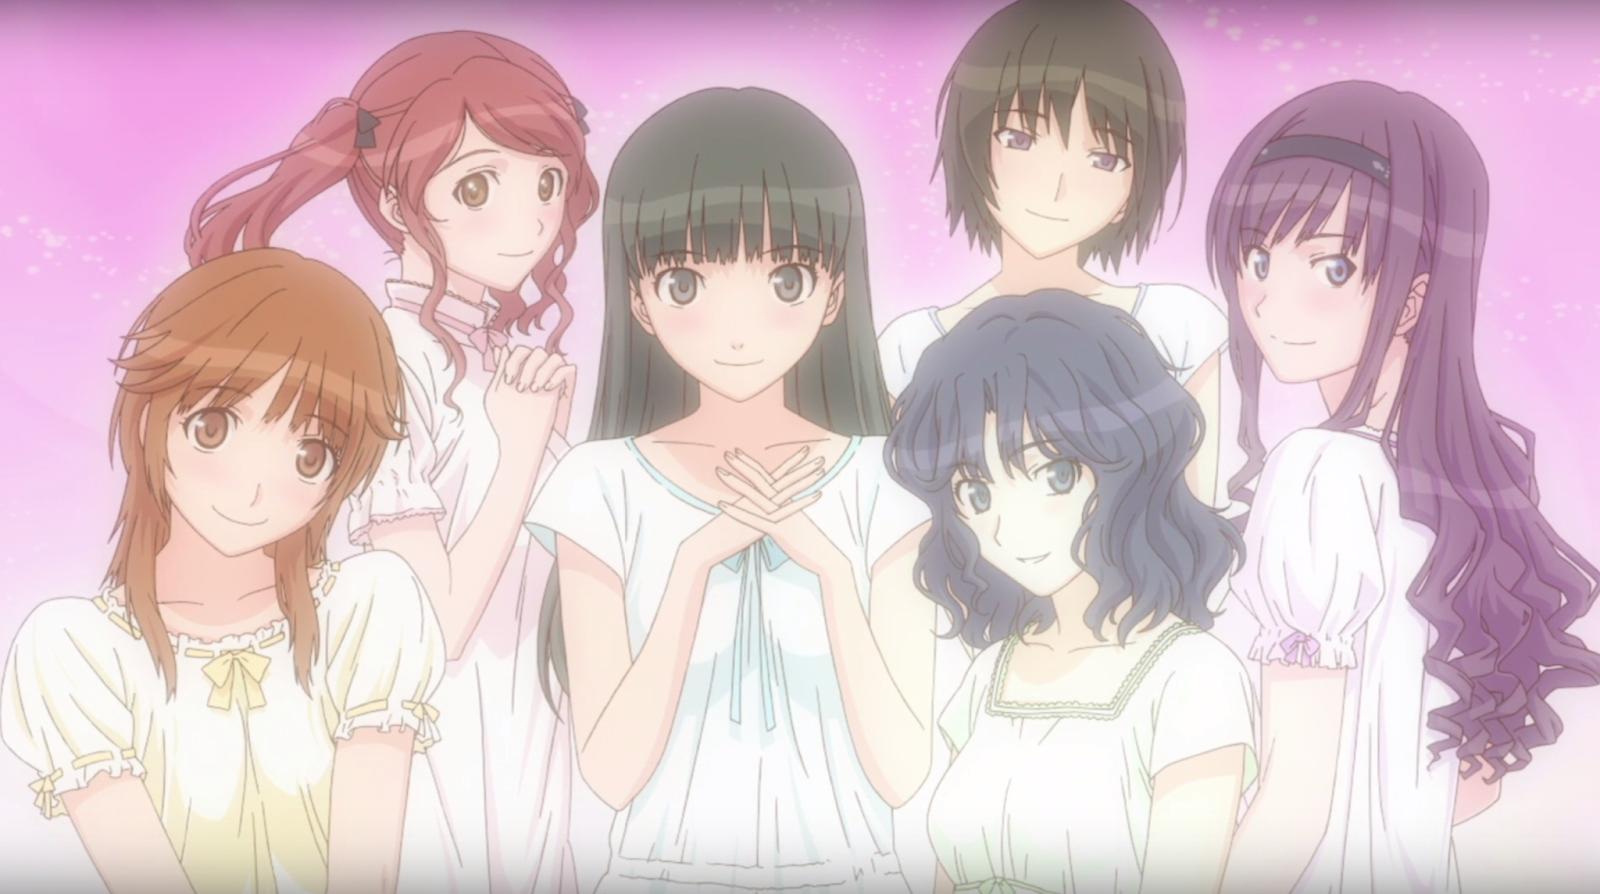 Amagami SS: A Romance Anime Where Everyone Wins! - Anime Locale